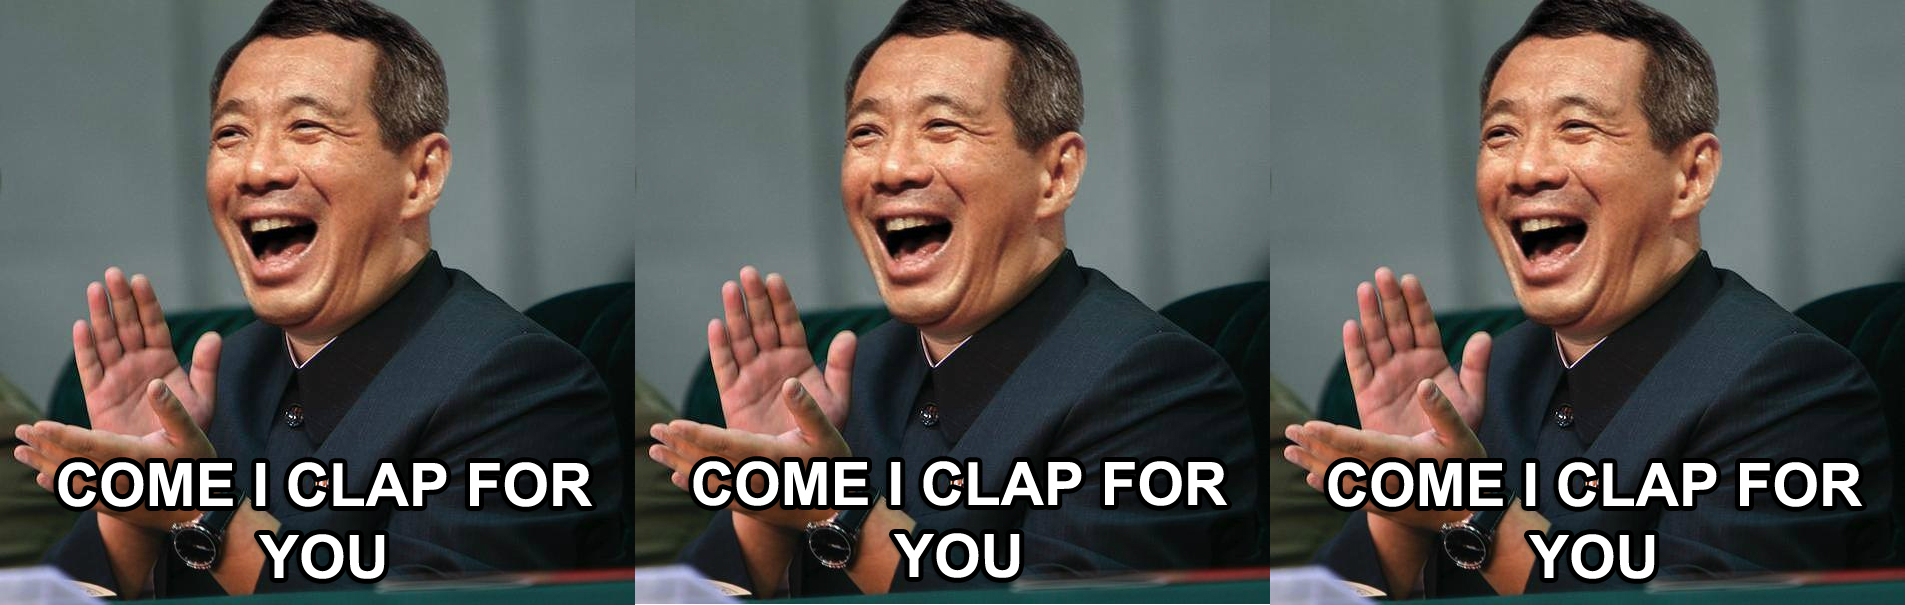 Could Dank Memes Shape the Future of Singaporean Politics?